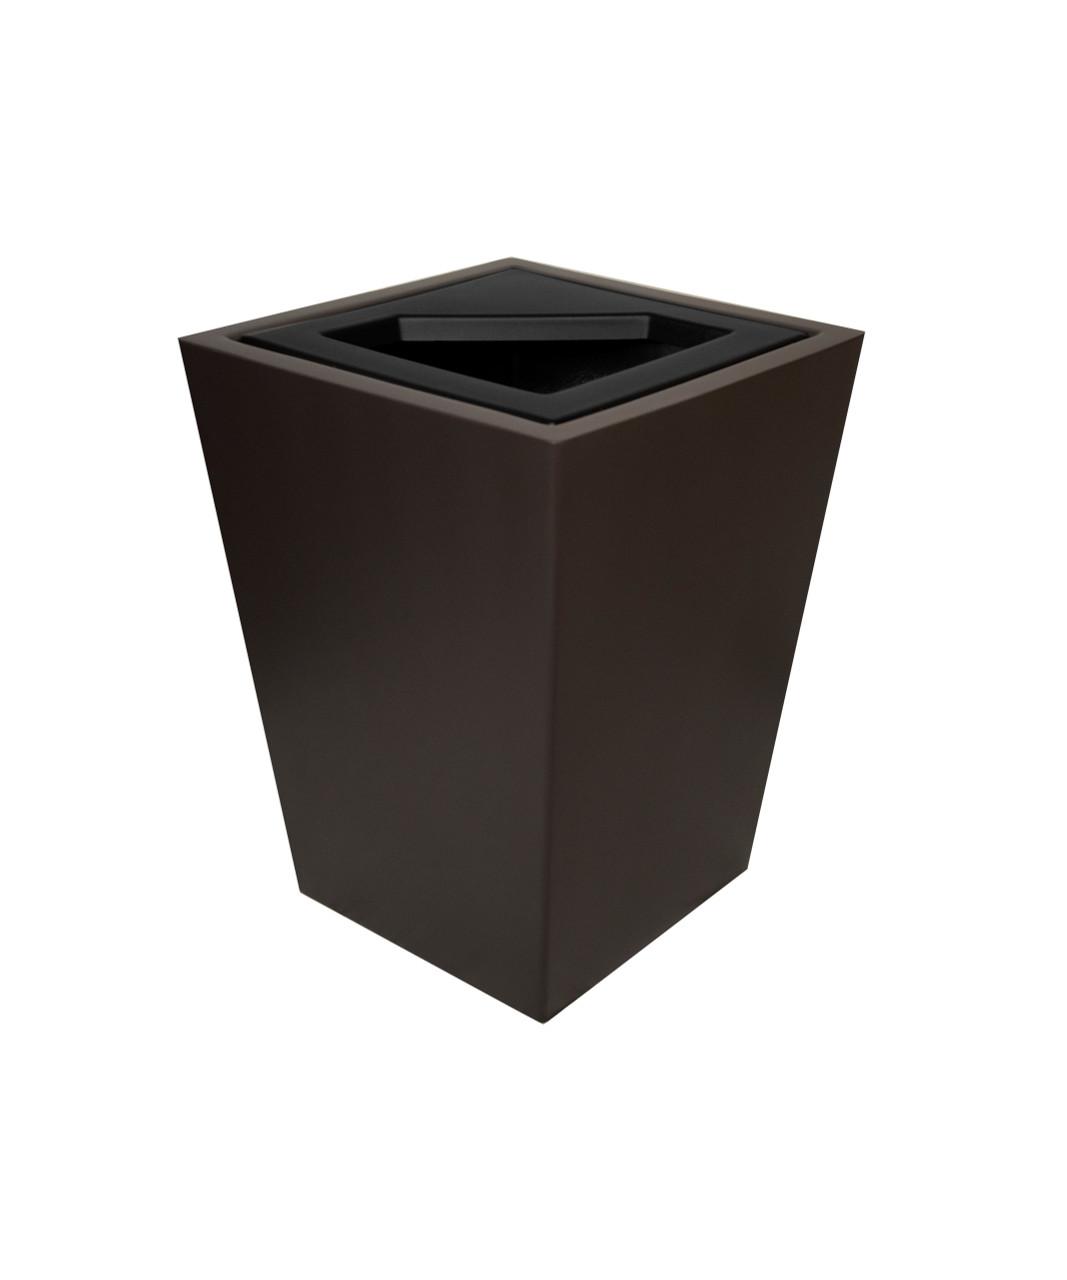 32 Gallon Fiberglass WINDSOR Decorative Trash Receptacle